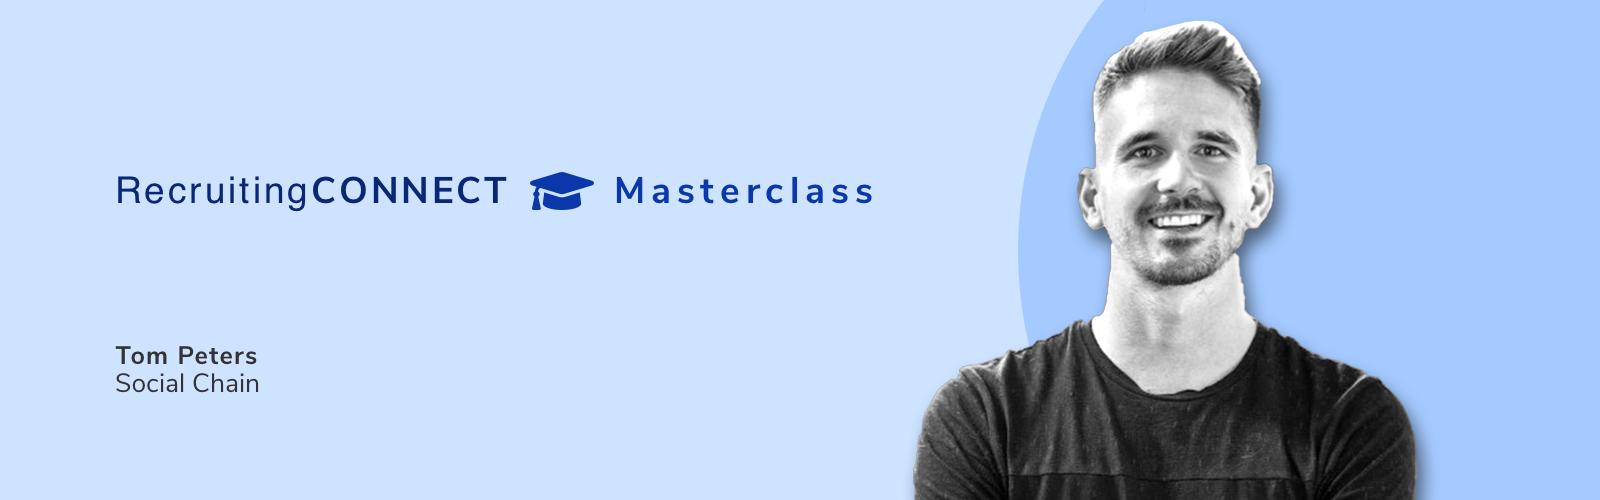 Talentry Webinar RecruitingCONNECT Masterclass Tom Peters